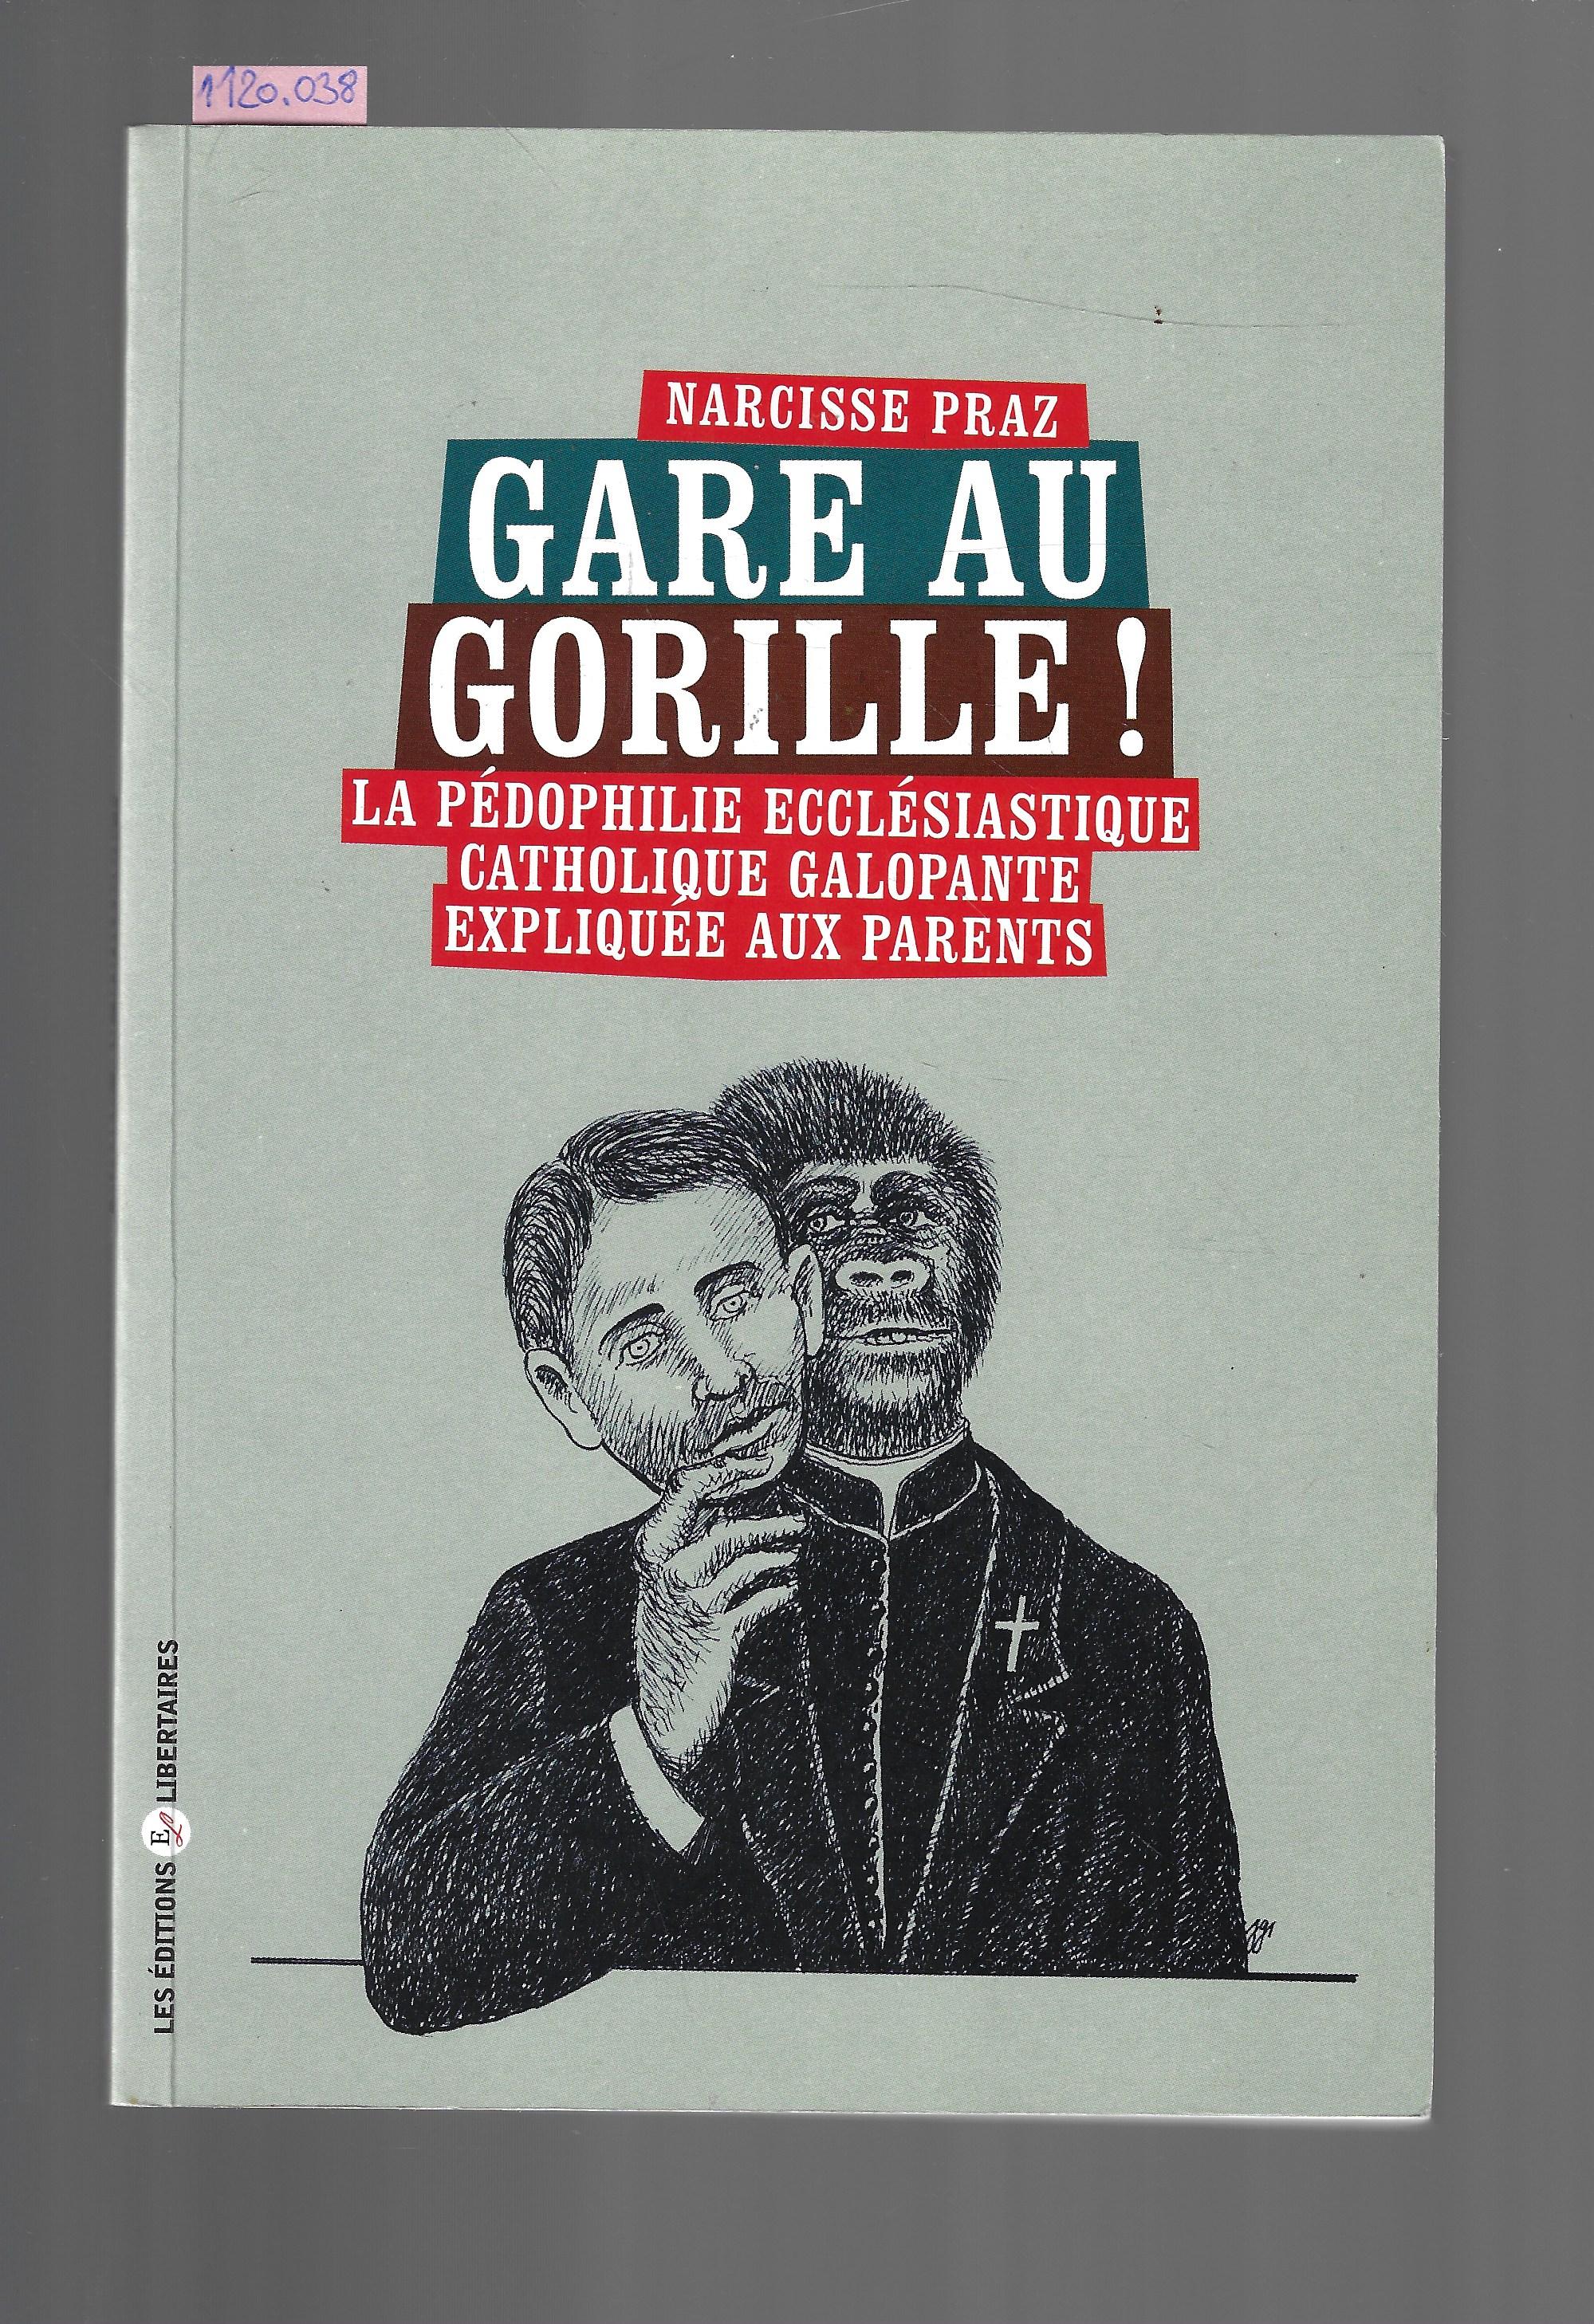 GARE AU GORILLE ! LA PEDOPHILIE ECCLESIASTIQUE CATHOLIQUE GALOPANTE EXPLIQUEE AUX PARENTS - Narcisse Praz